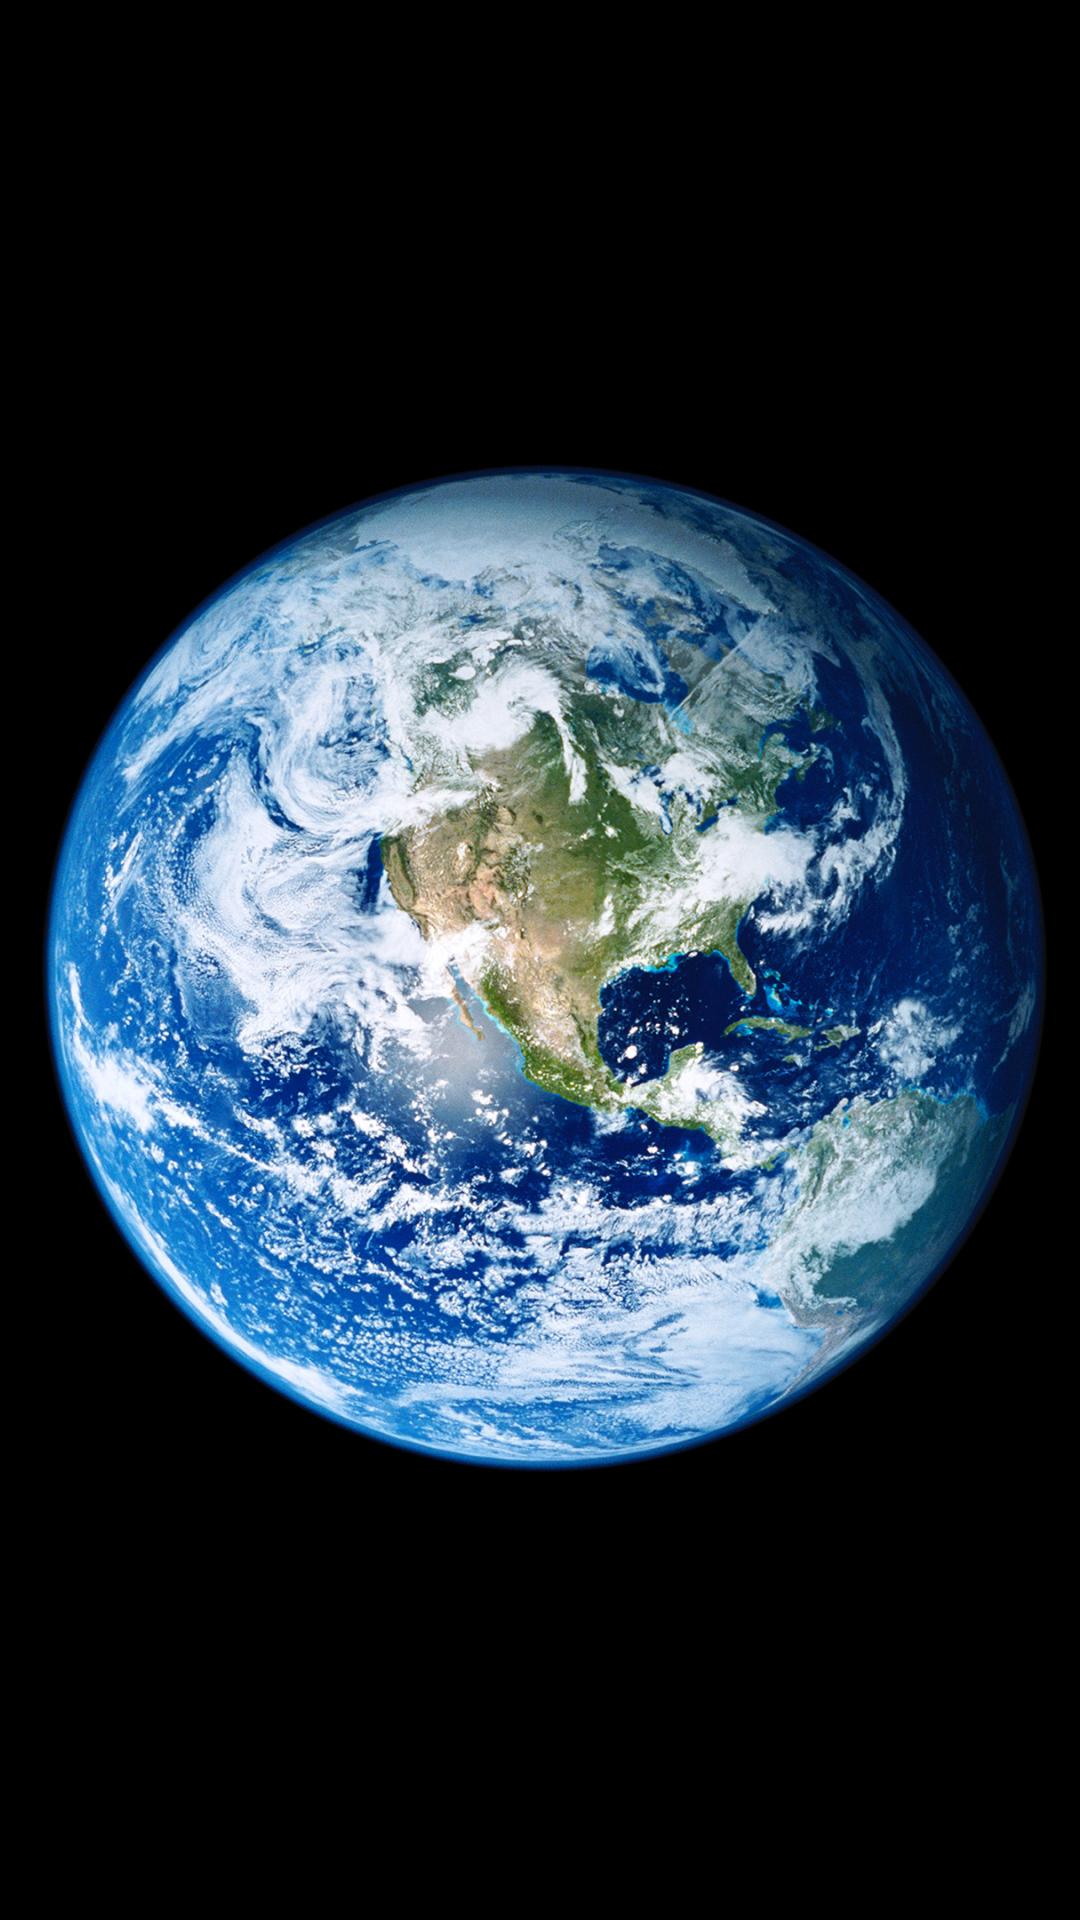 Ios 11 Earth, HD 4K Wallpaper